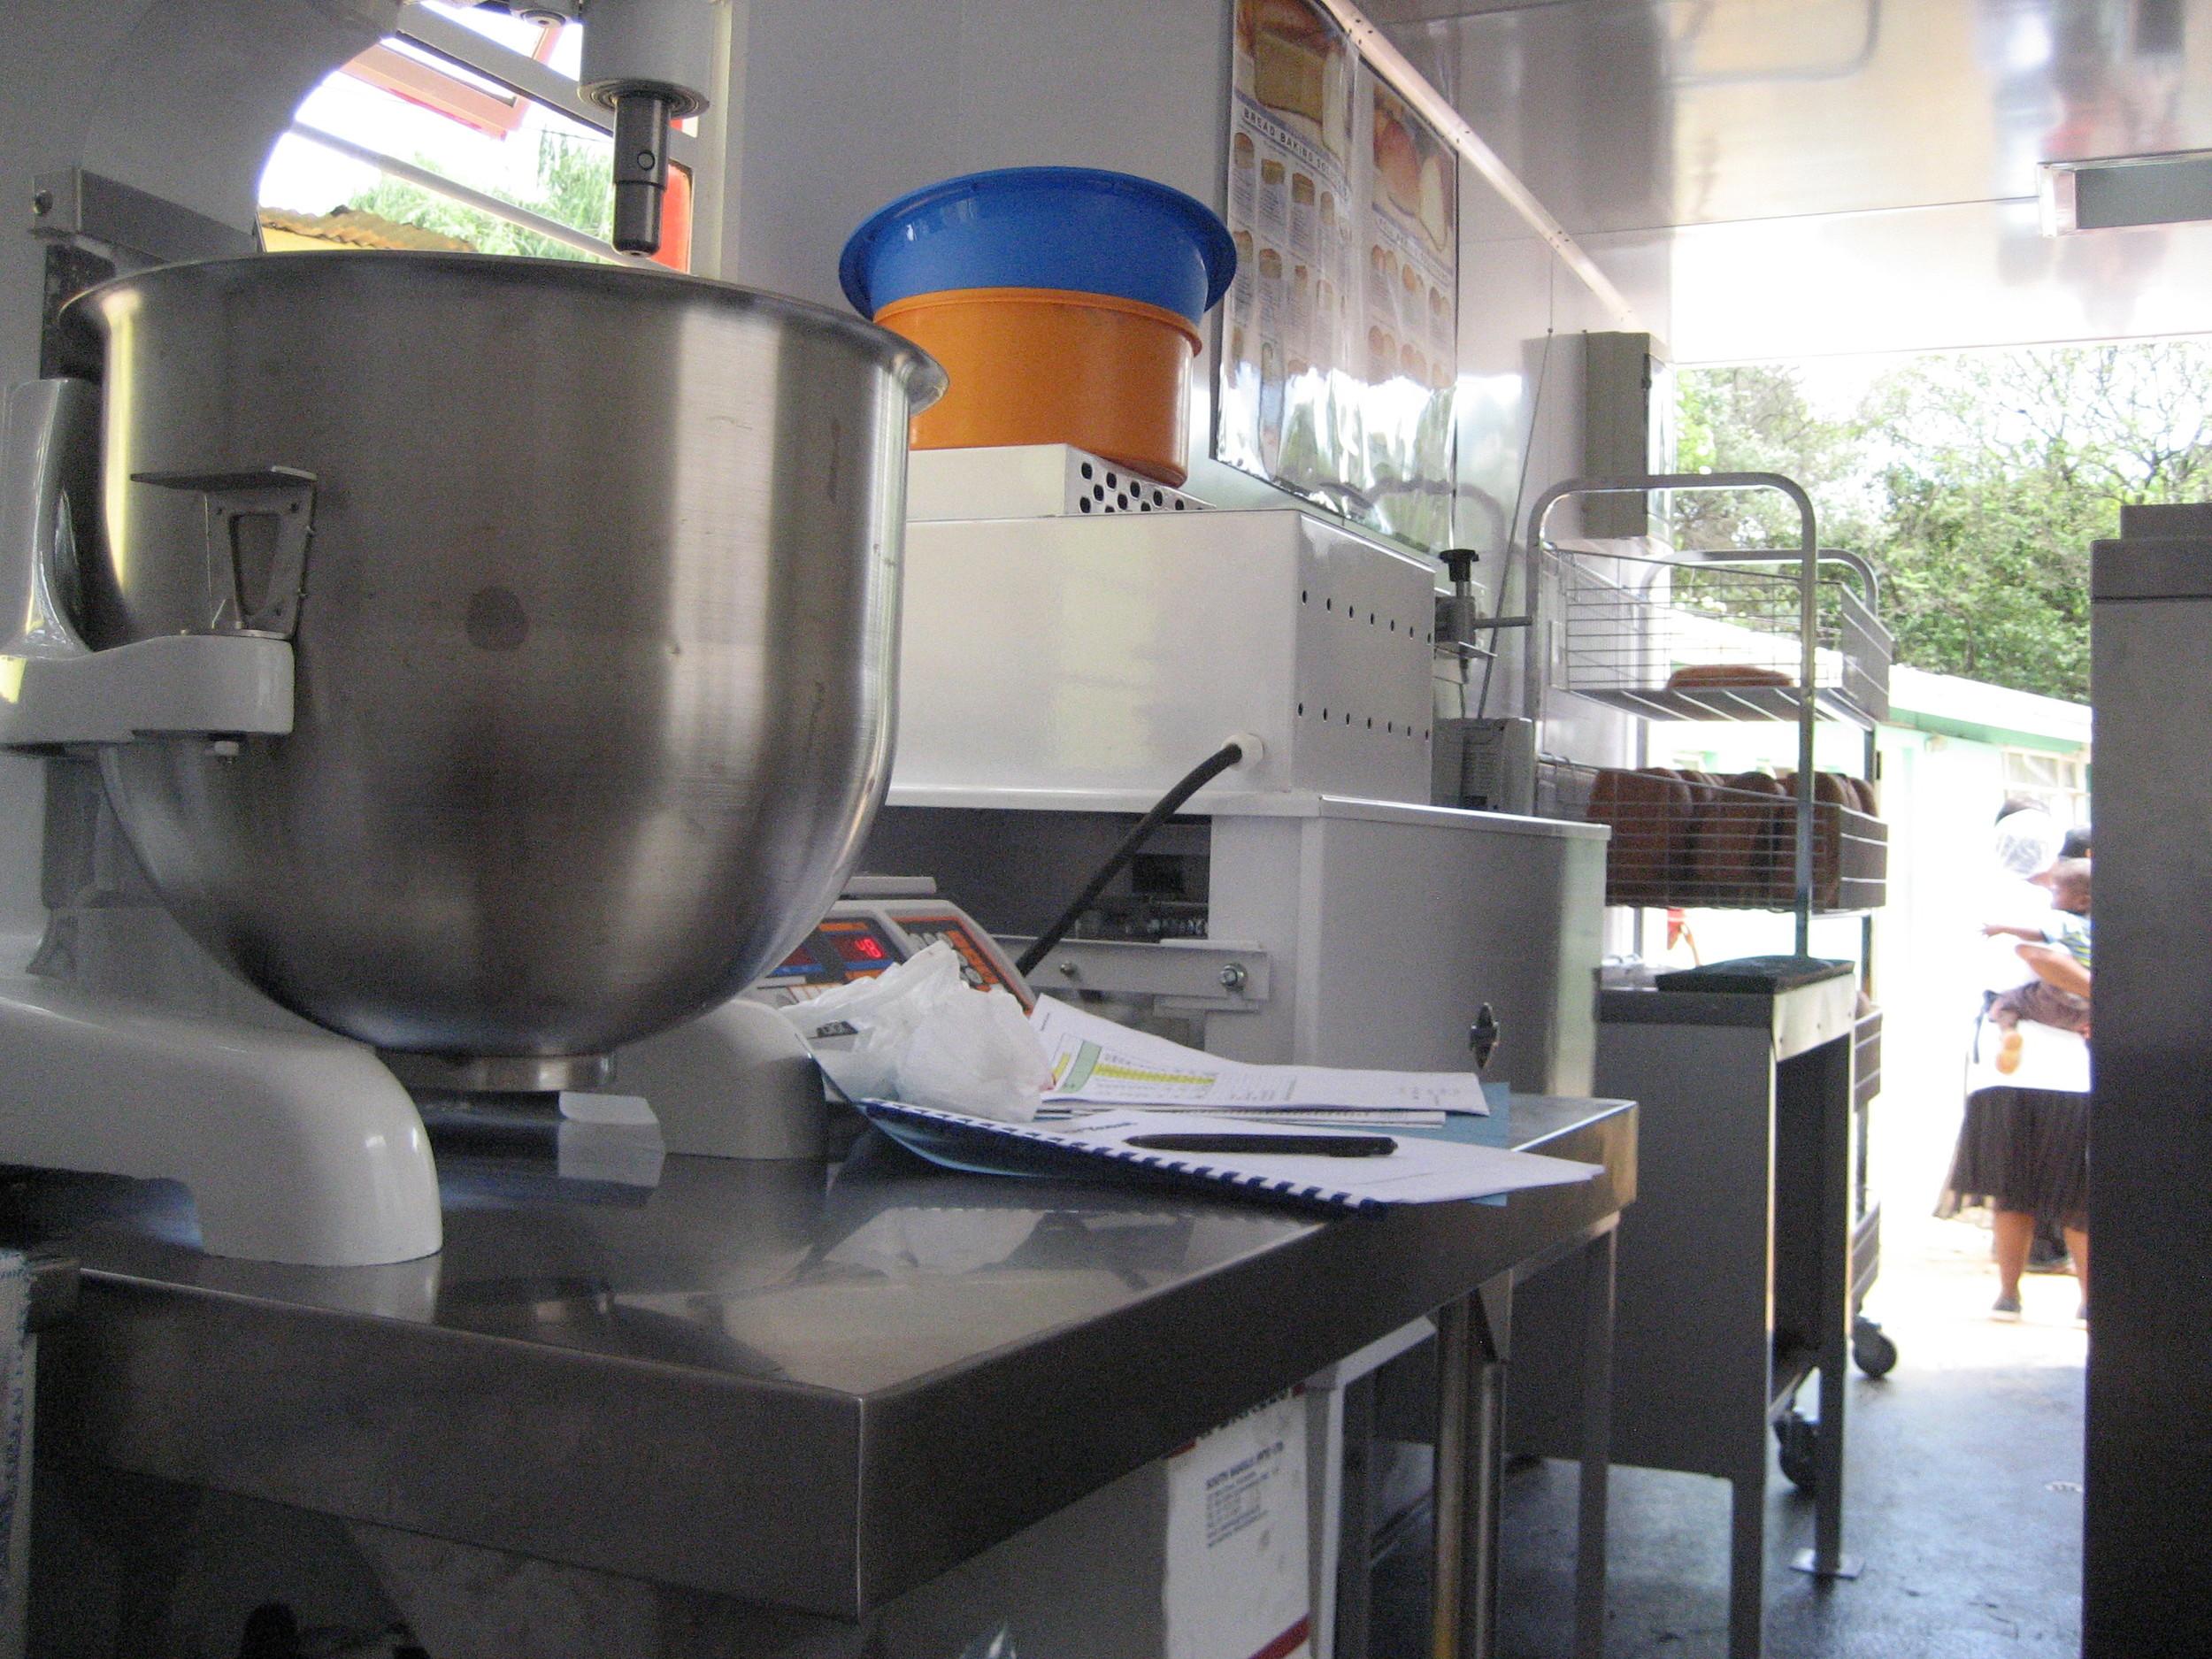 Nkosi inside mixer.JPG